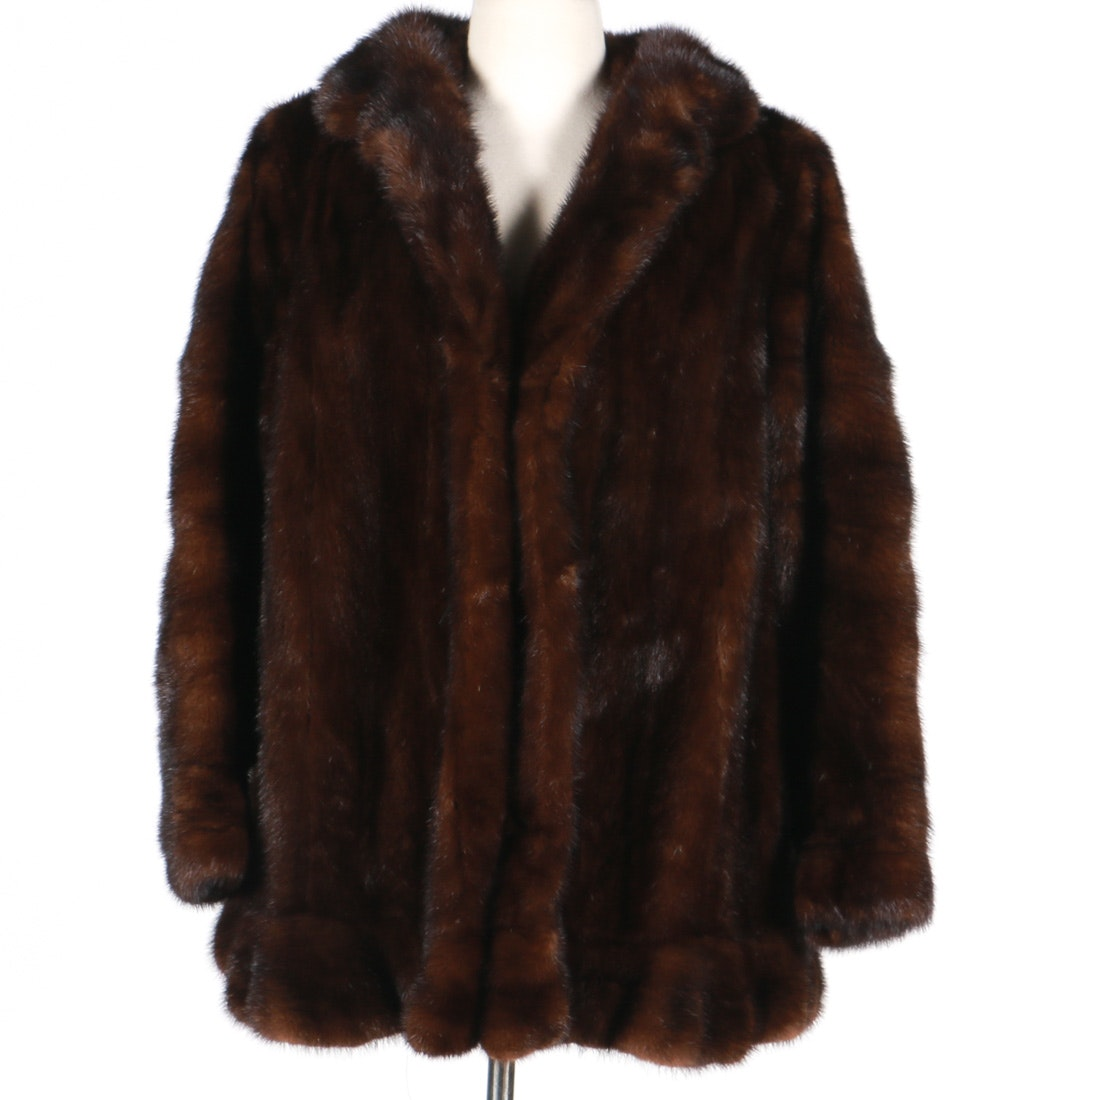 Vintage Women's Mahogany Mink Coat